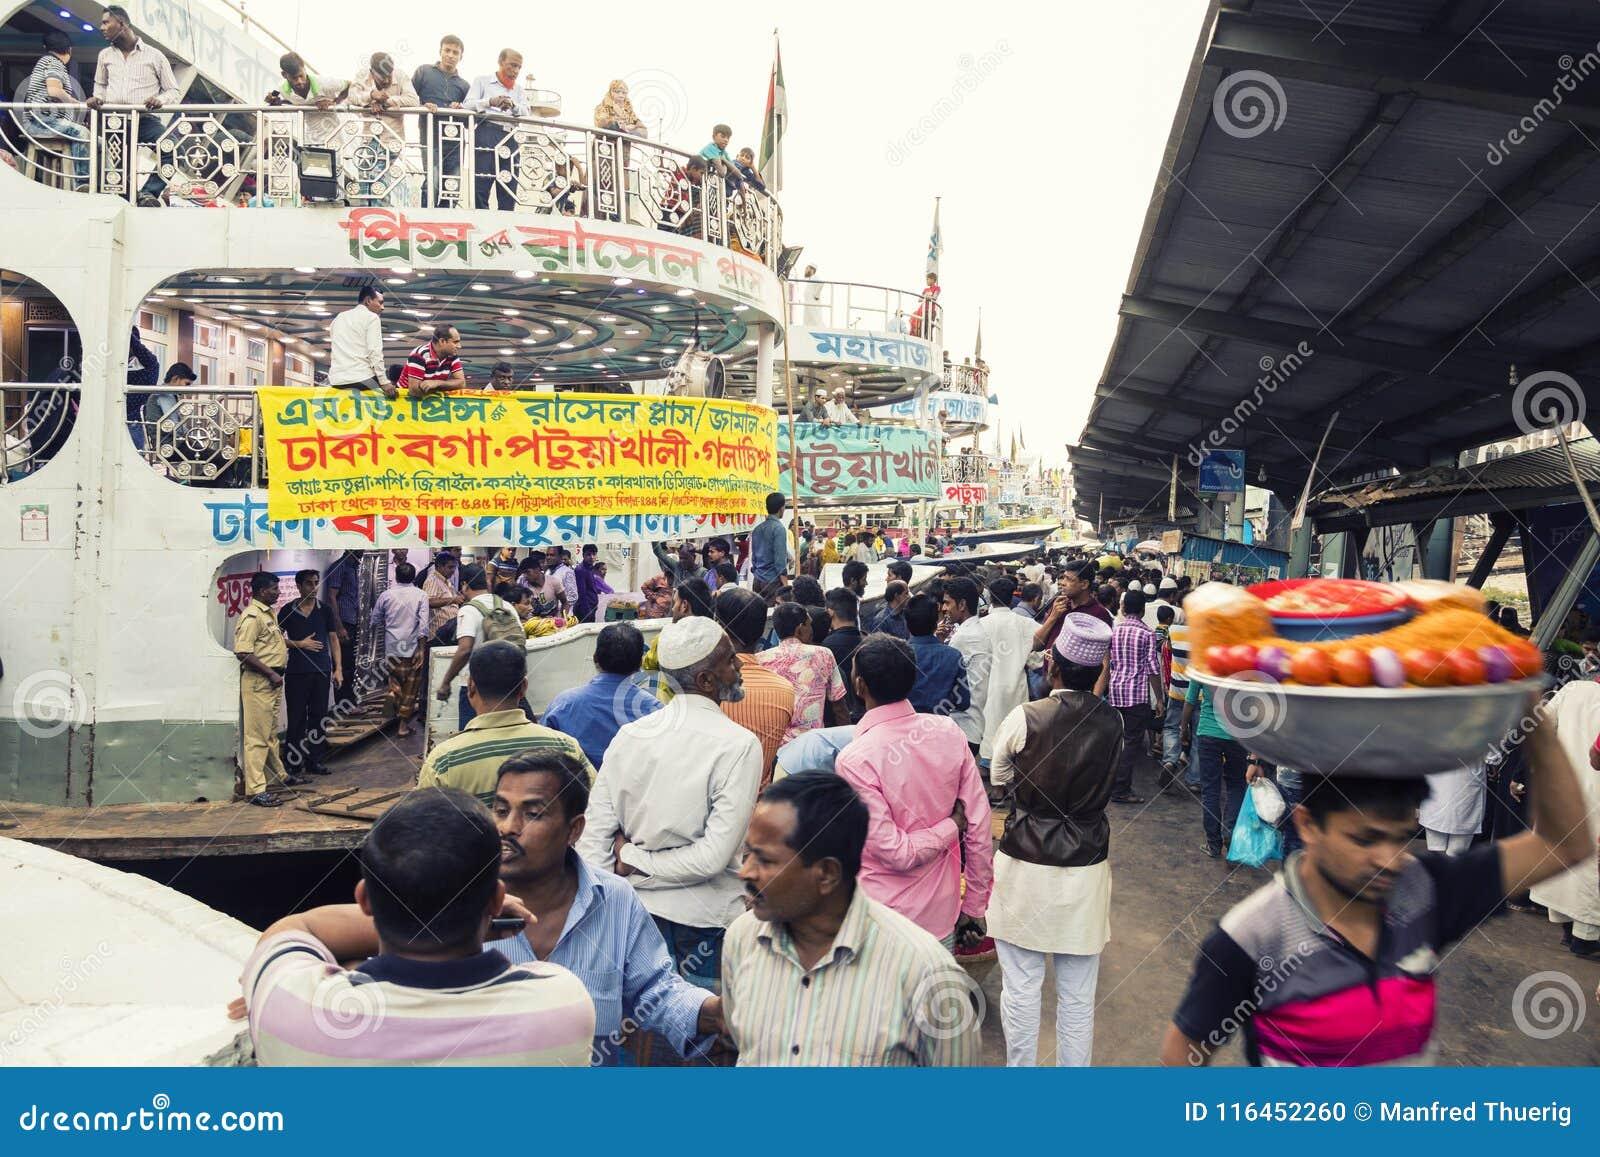 Dhaka, Bangladesch, am 24. Februar 2017: Bunte hastige Geschäftigkeit am Sadarghat-Pier in Dhaka